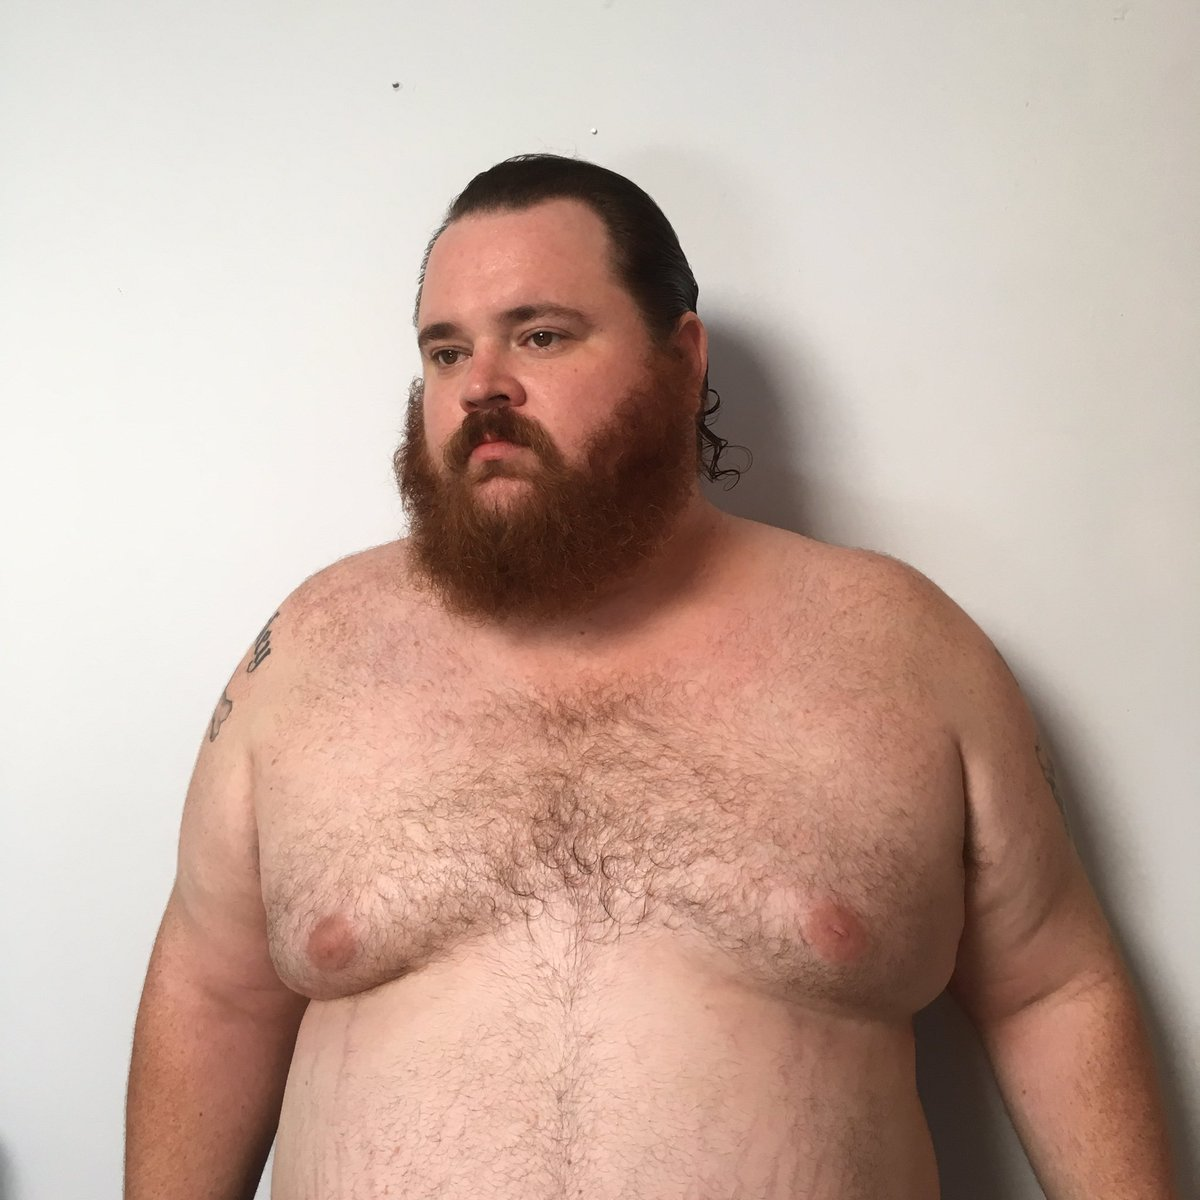 K. Trevor Wilson nude (55 photo), Topless, Hot, Selfie, lingerie 2017